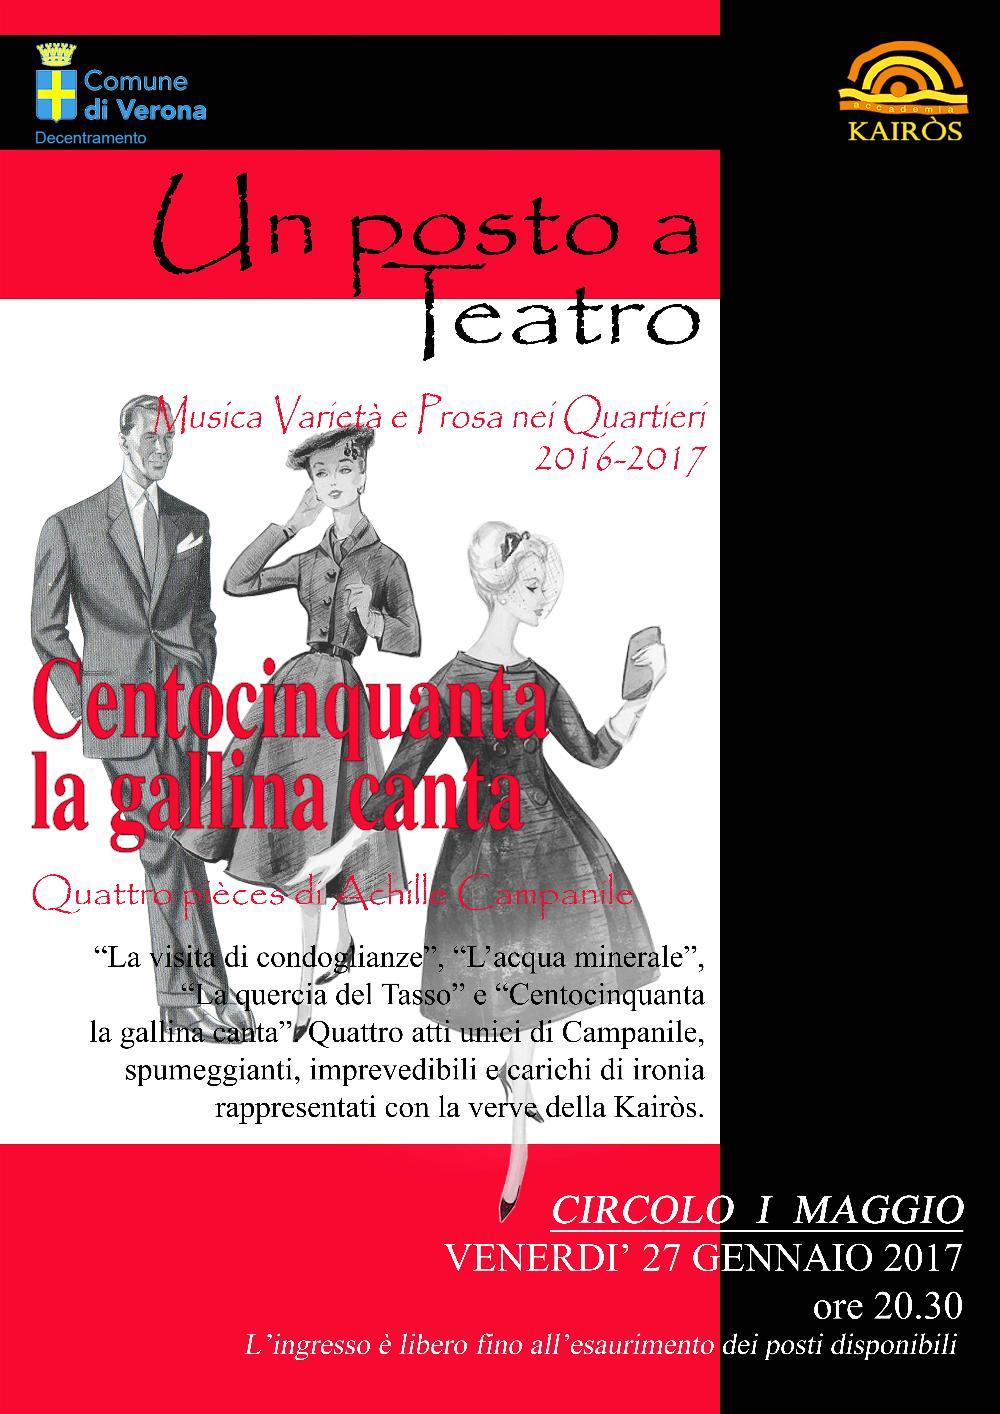 centocinquanta-la-gallina-canta-www-imagesplitter-net-2